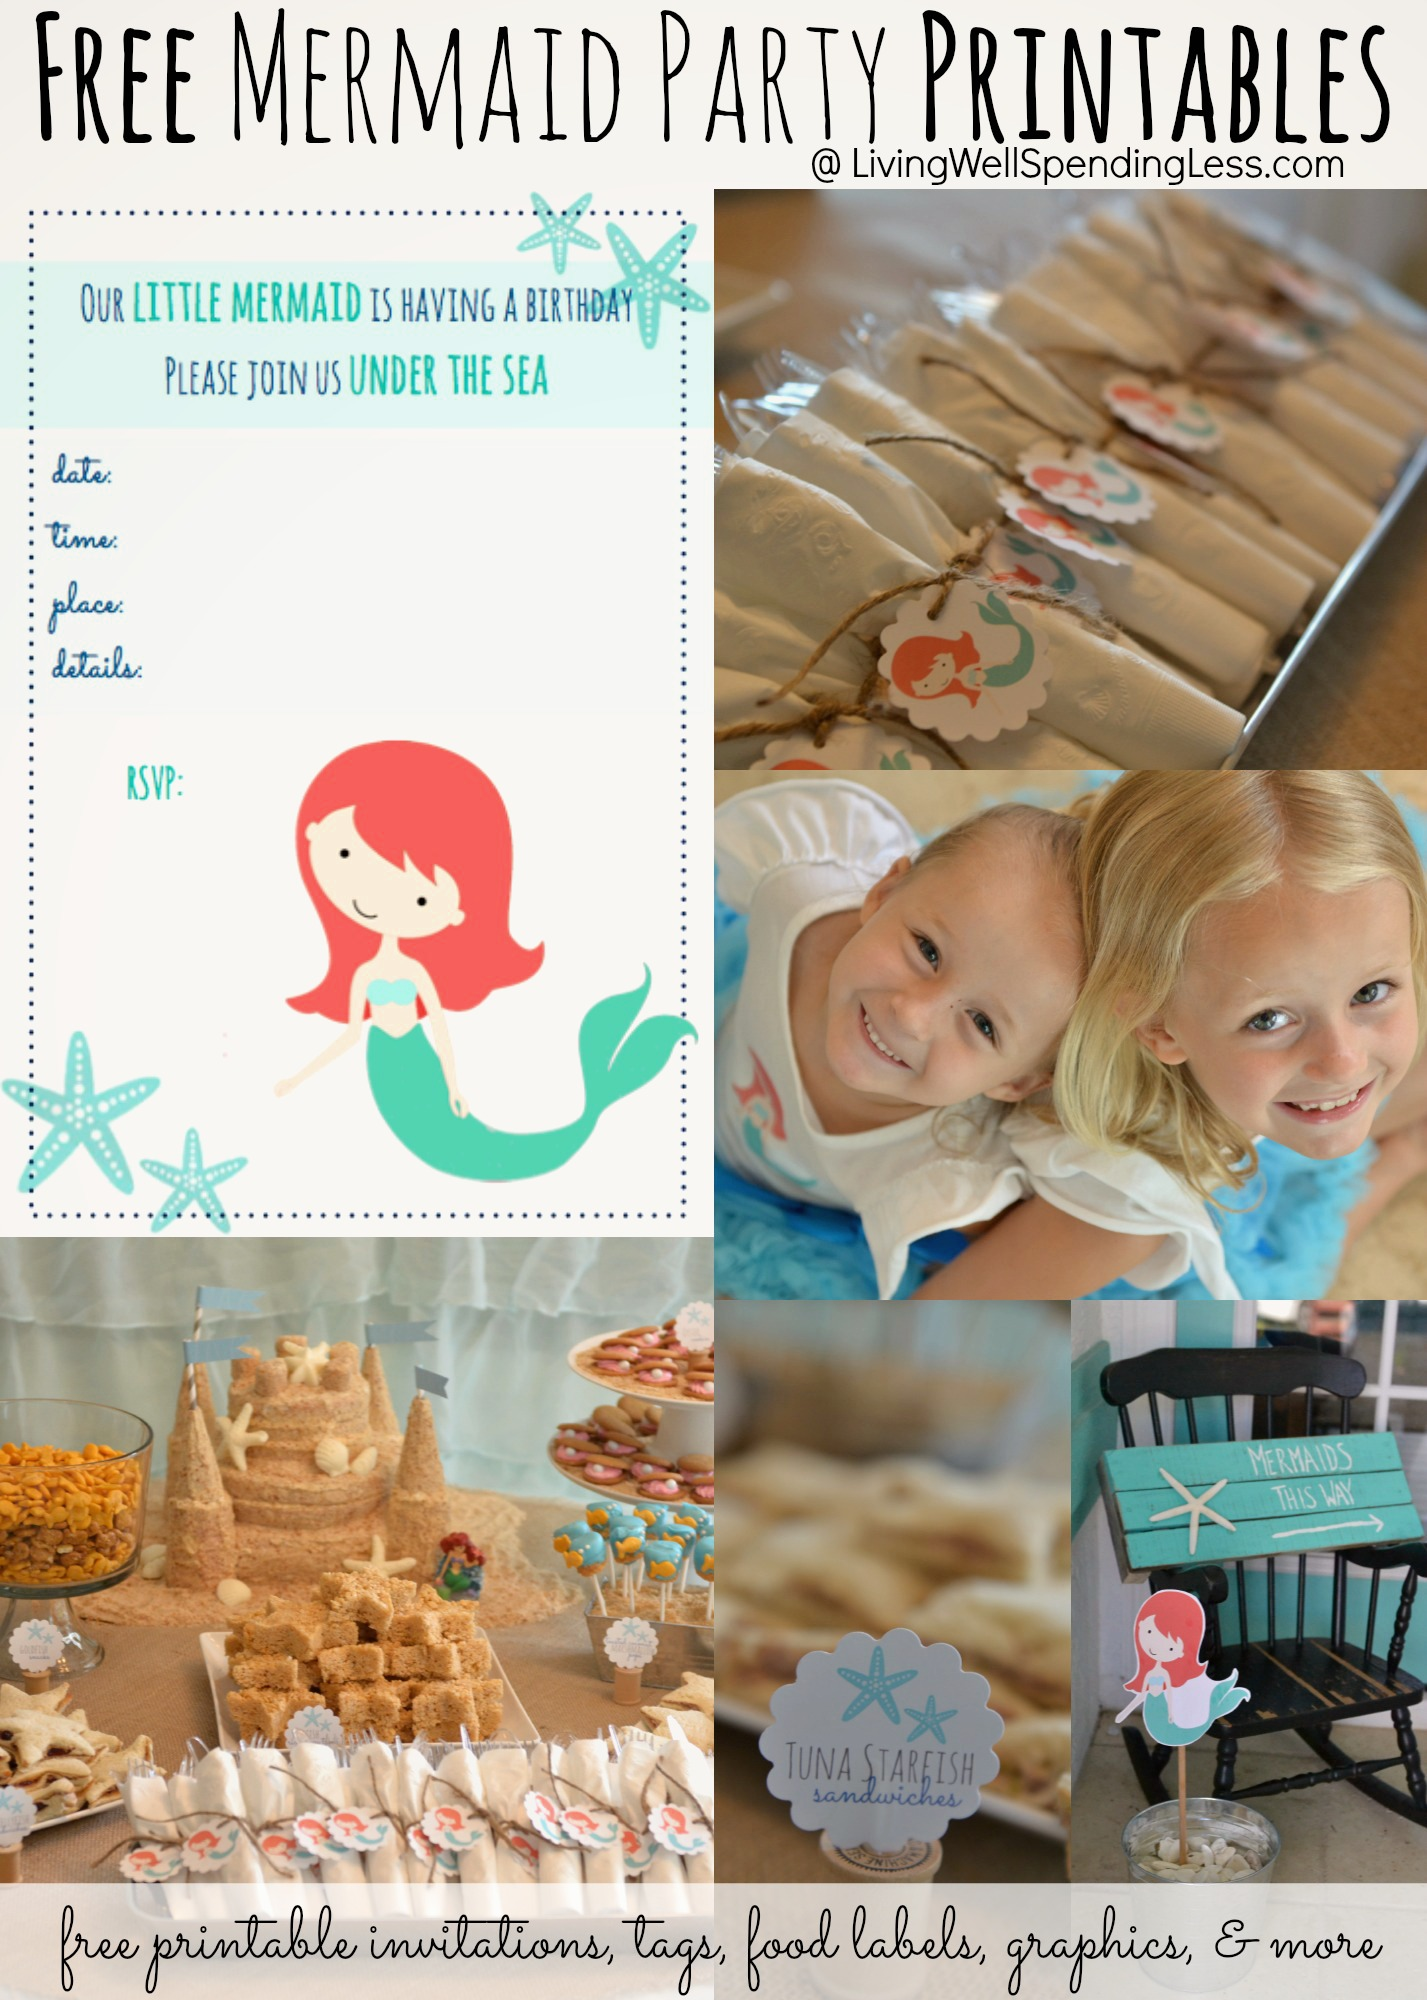 Free Mermaid Party Printables Cute Printable Invitations